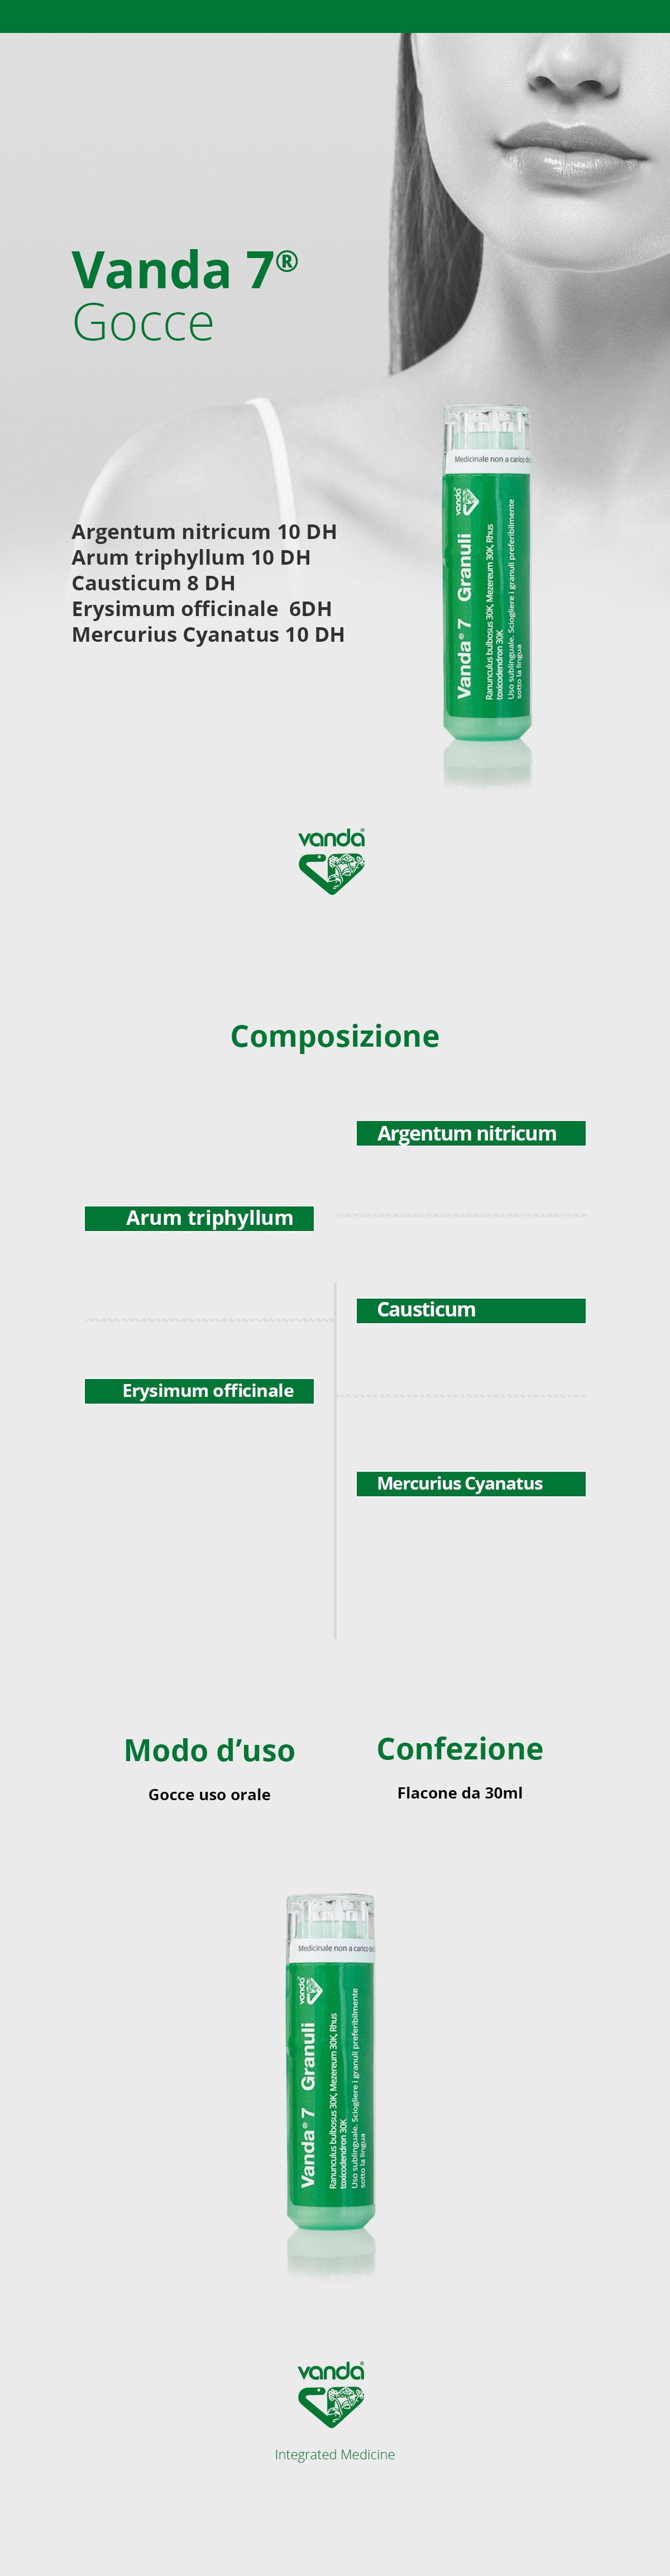 Infografica Vanda 7 (Afonia)